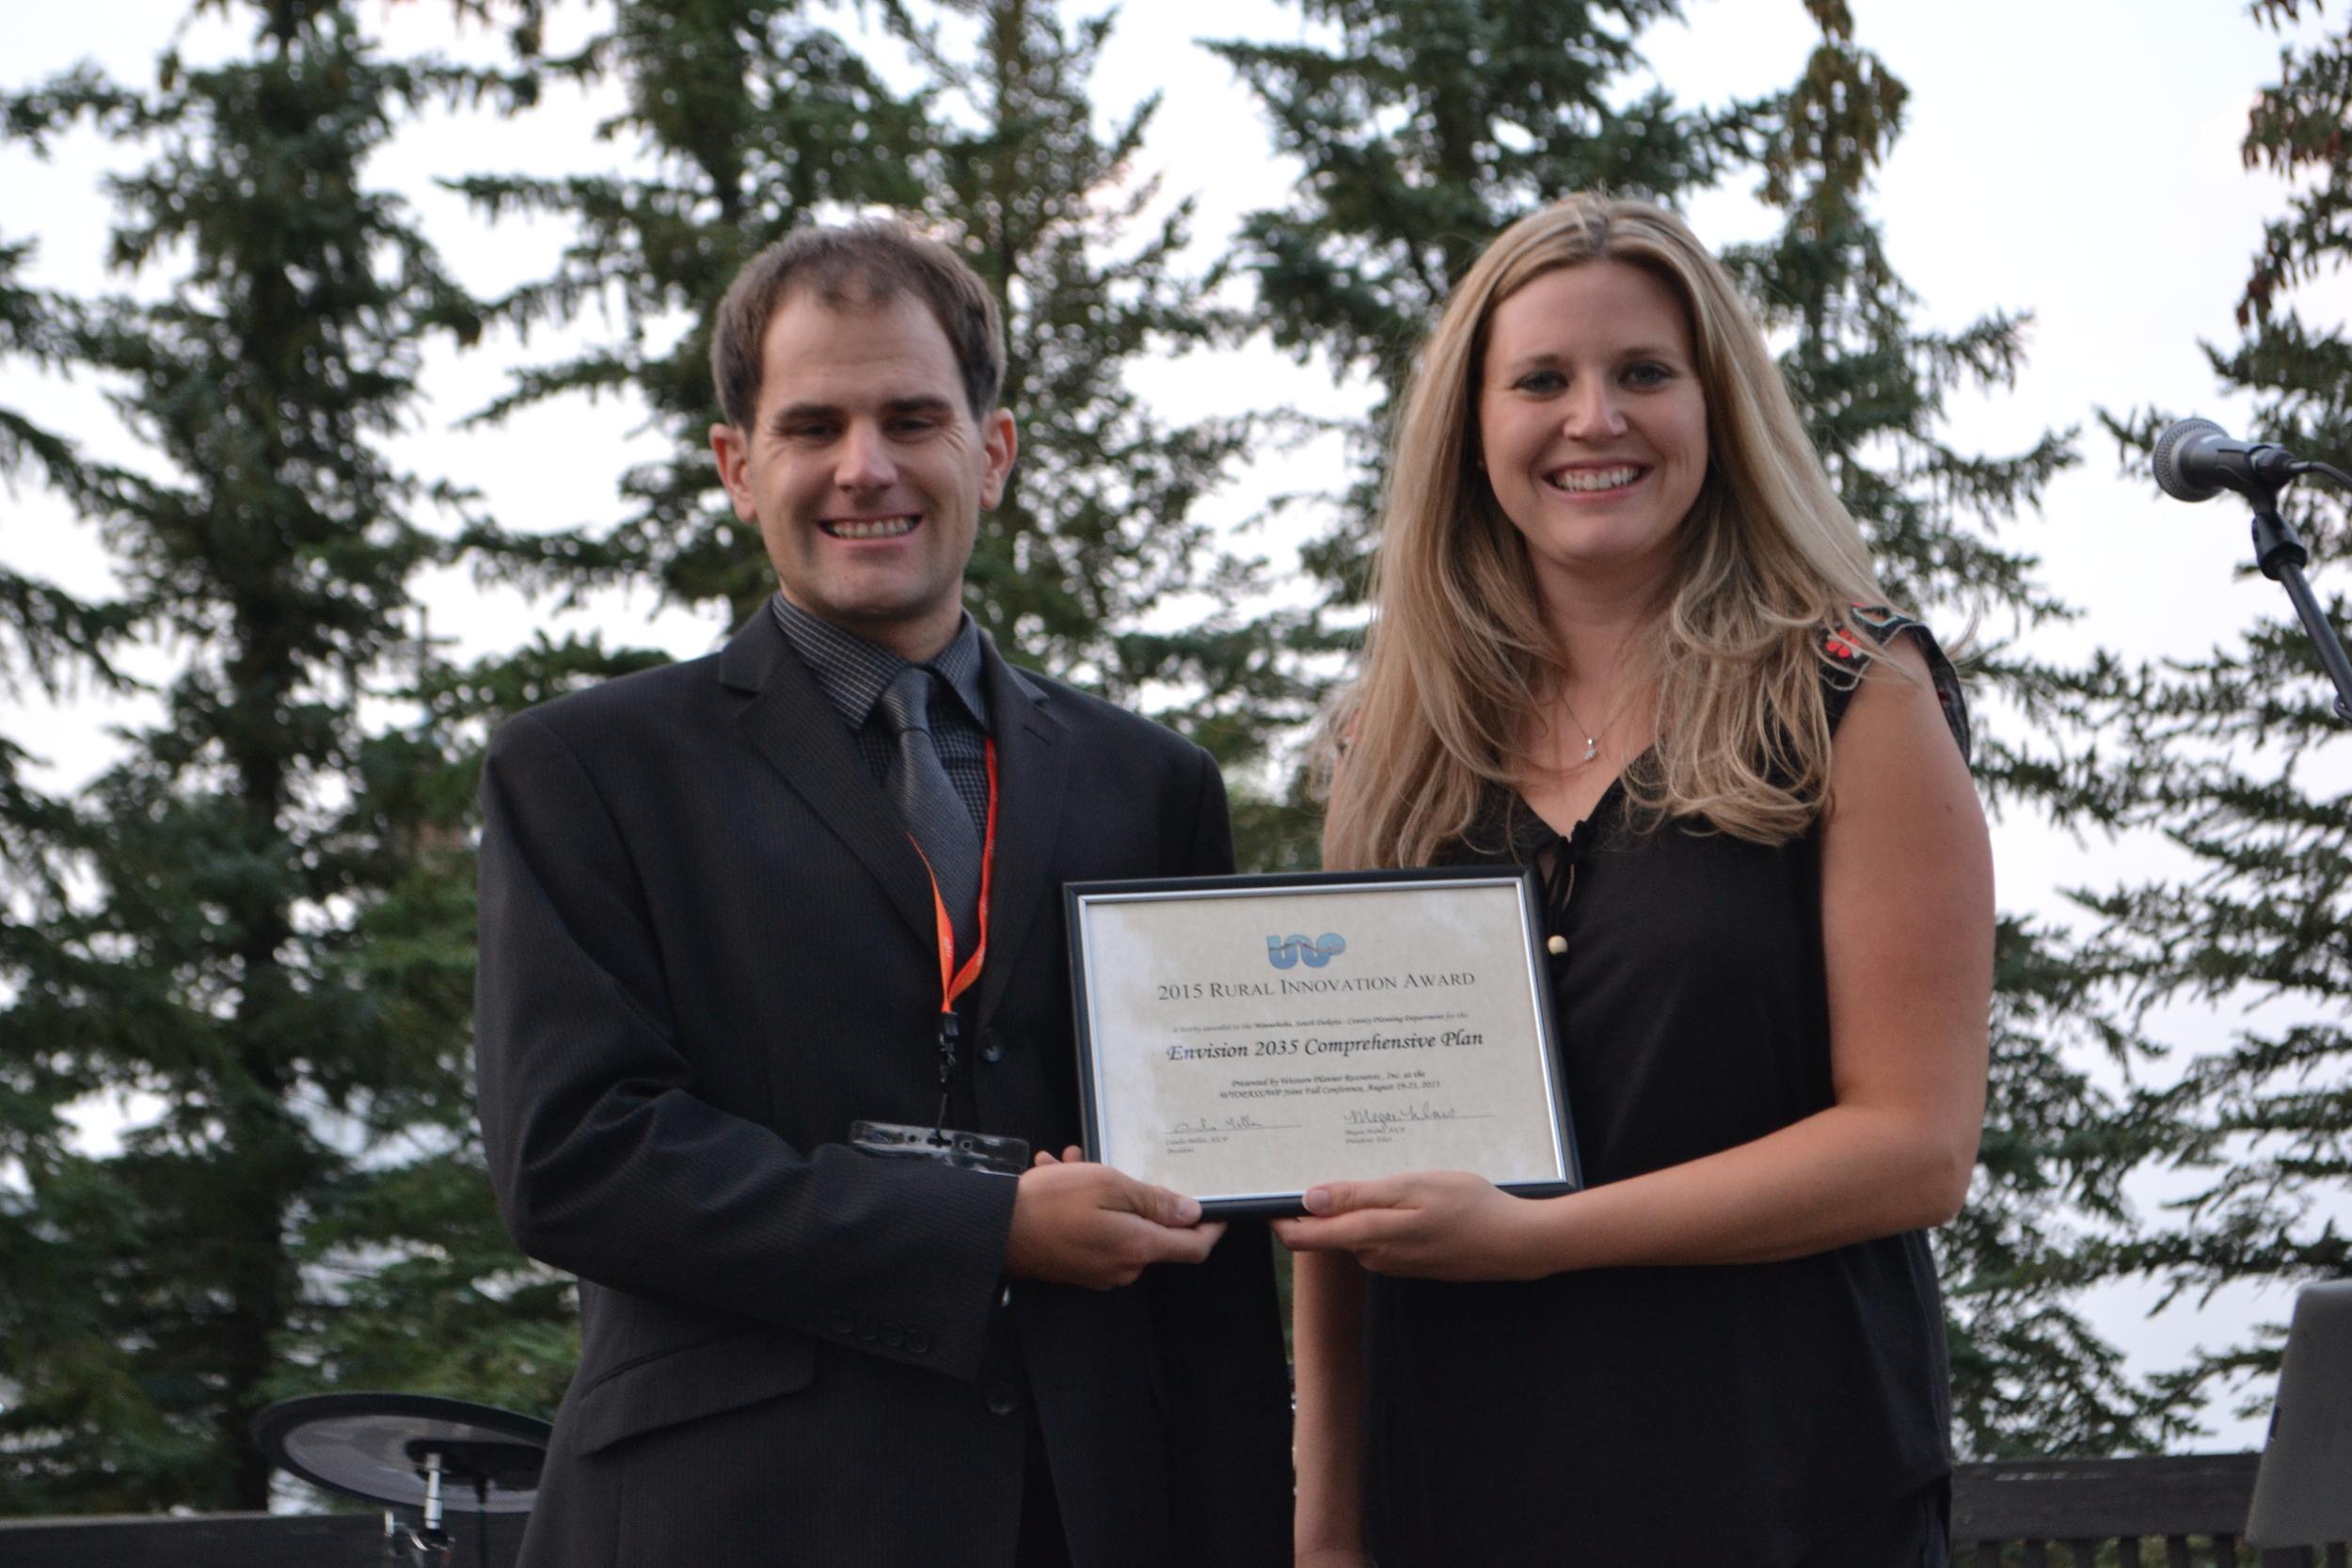 Rural Innovation Award — Minnehaha County, South Dakota